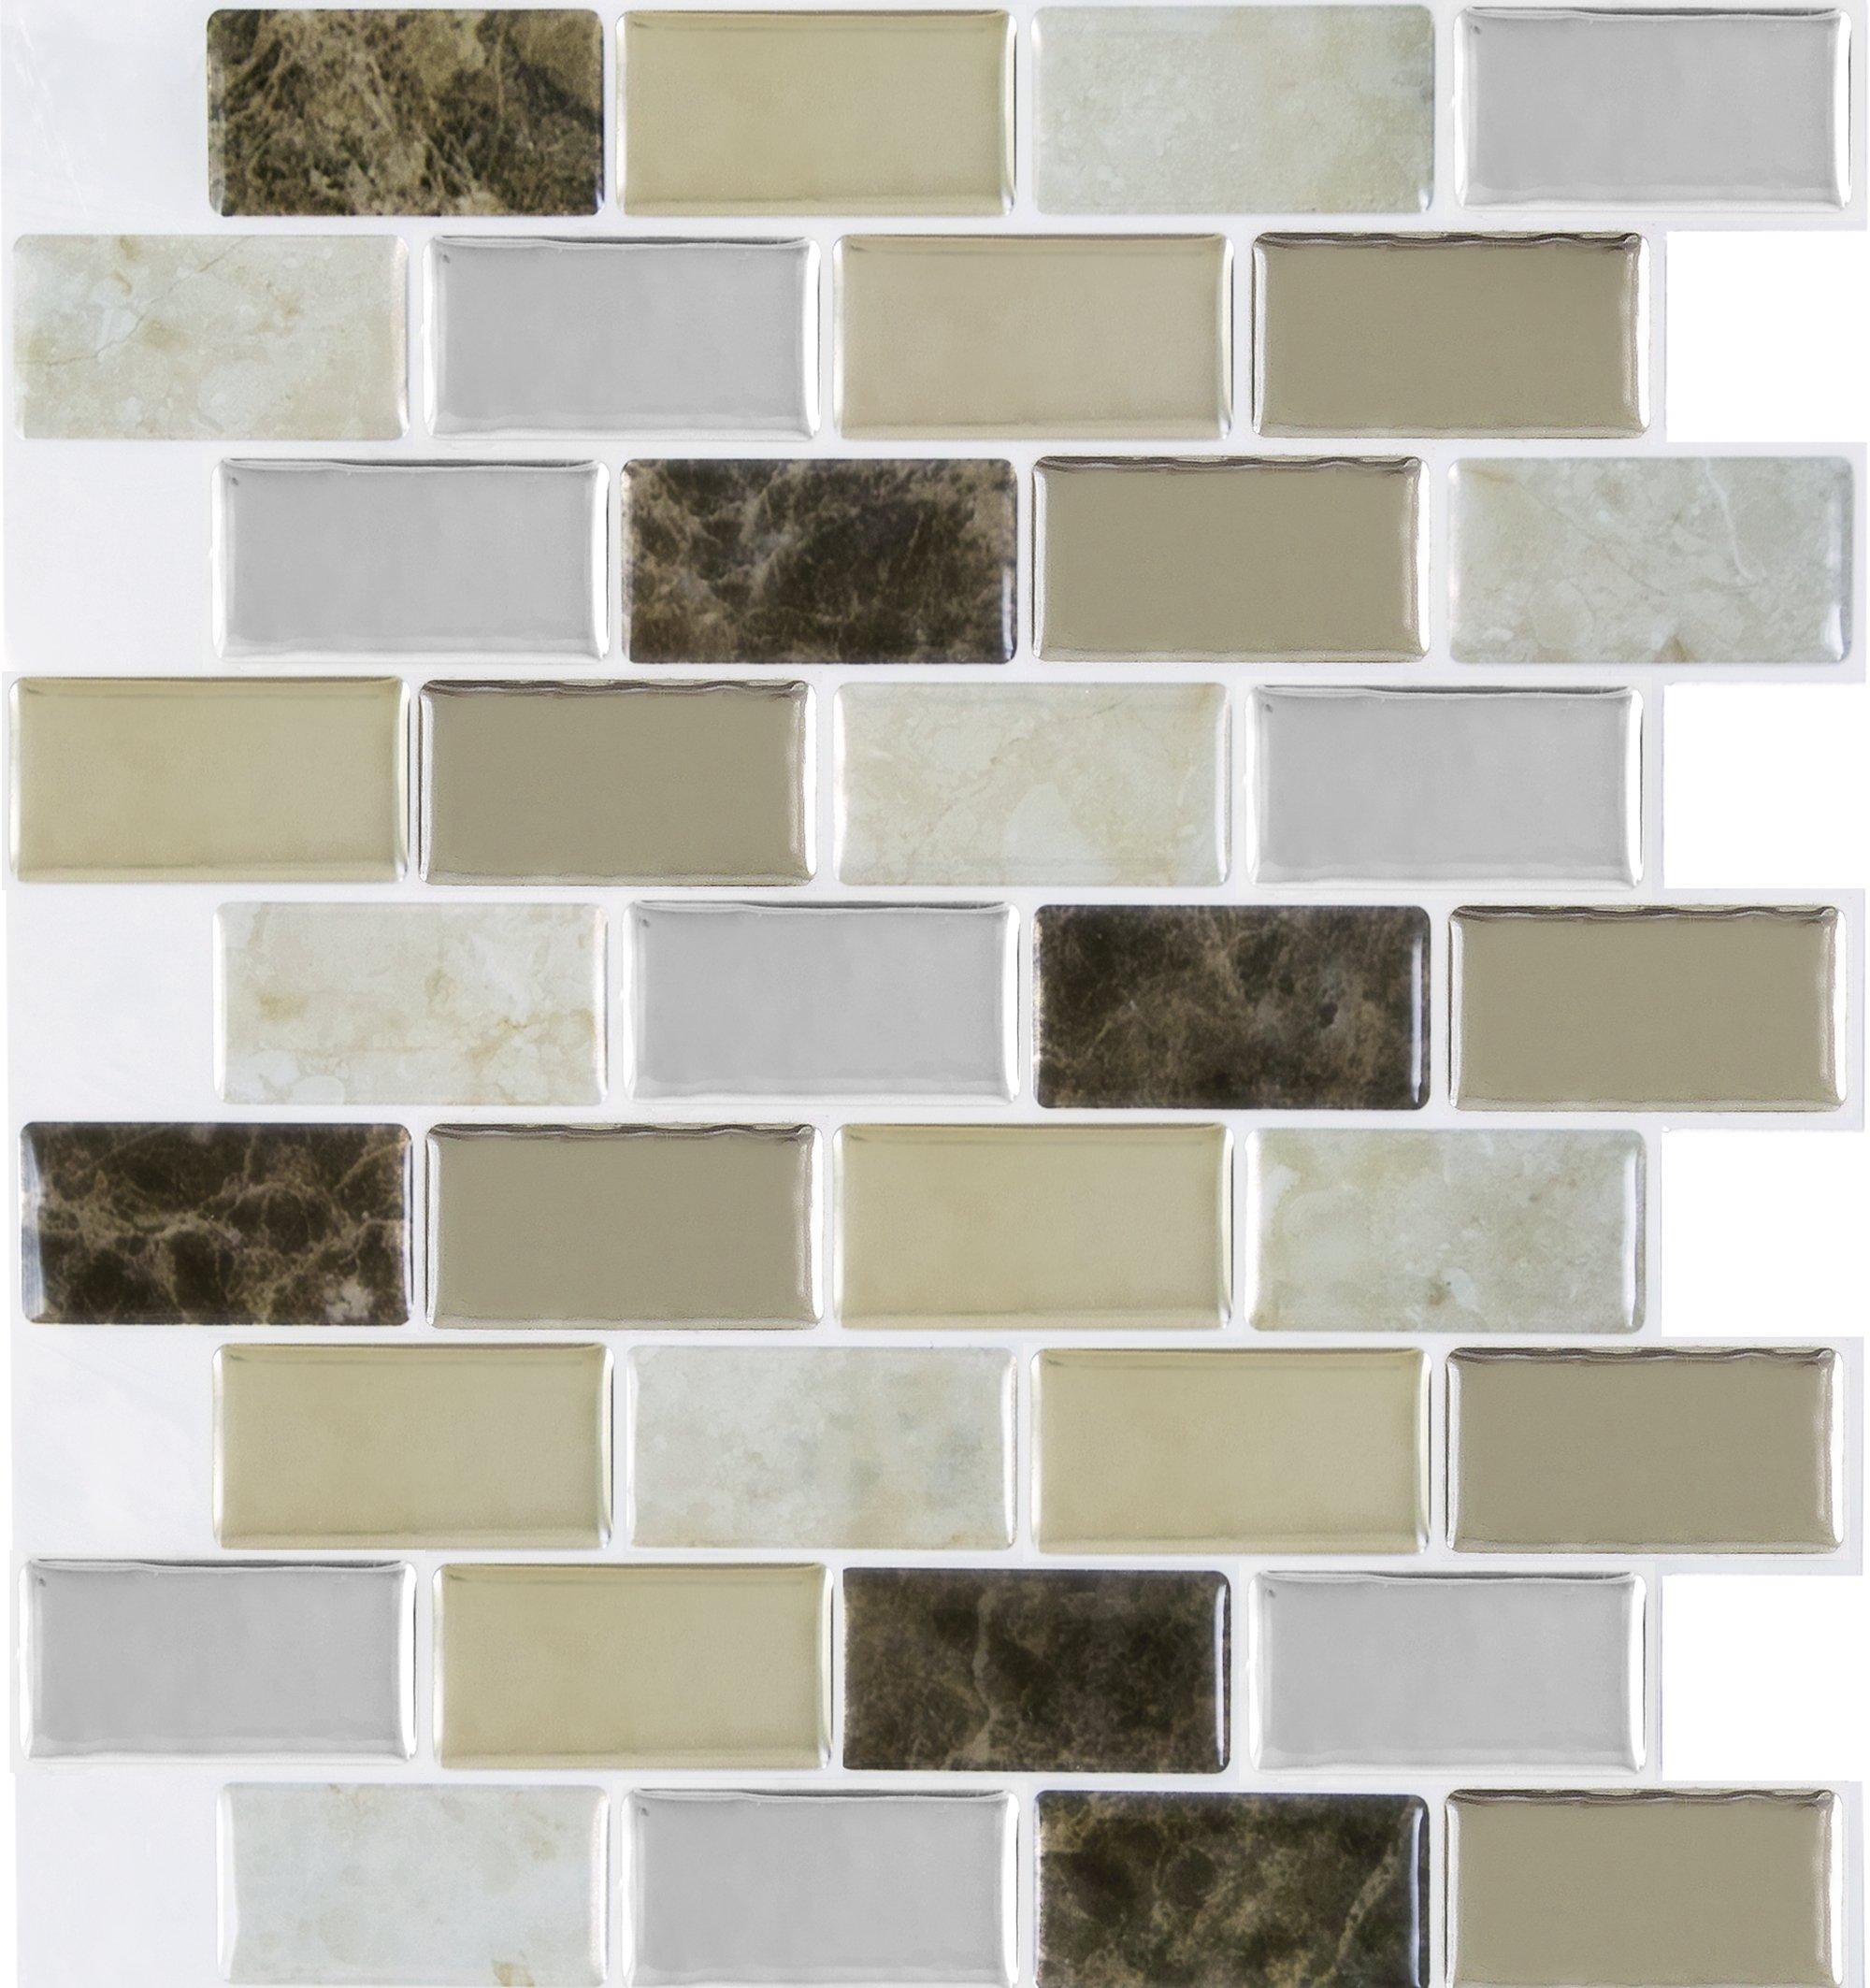 Achim Home Furnishings MGTBRZGR03 Magic Gel Bronze Granite 9.125 inch x 9.125 inch Self Adhesive Vinyl Wall Tile, 3 Tiles/2.25 sq Ft. by Achim Home Furnishings